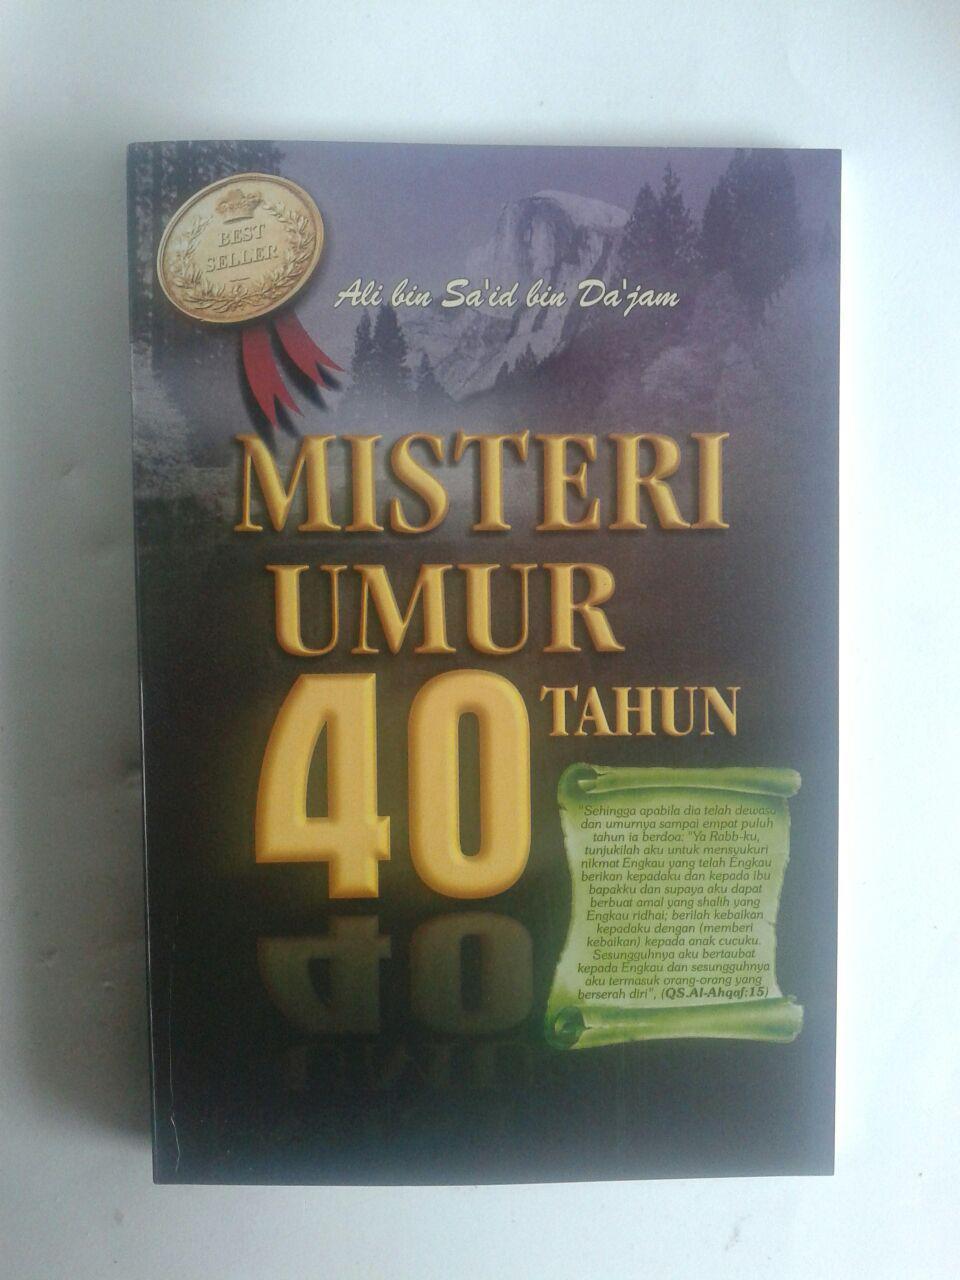 Buku Misteri Umur 40 Tahun isi